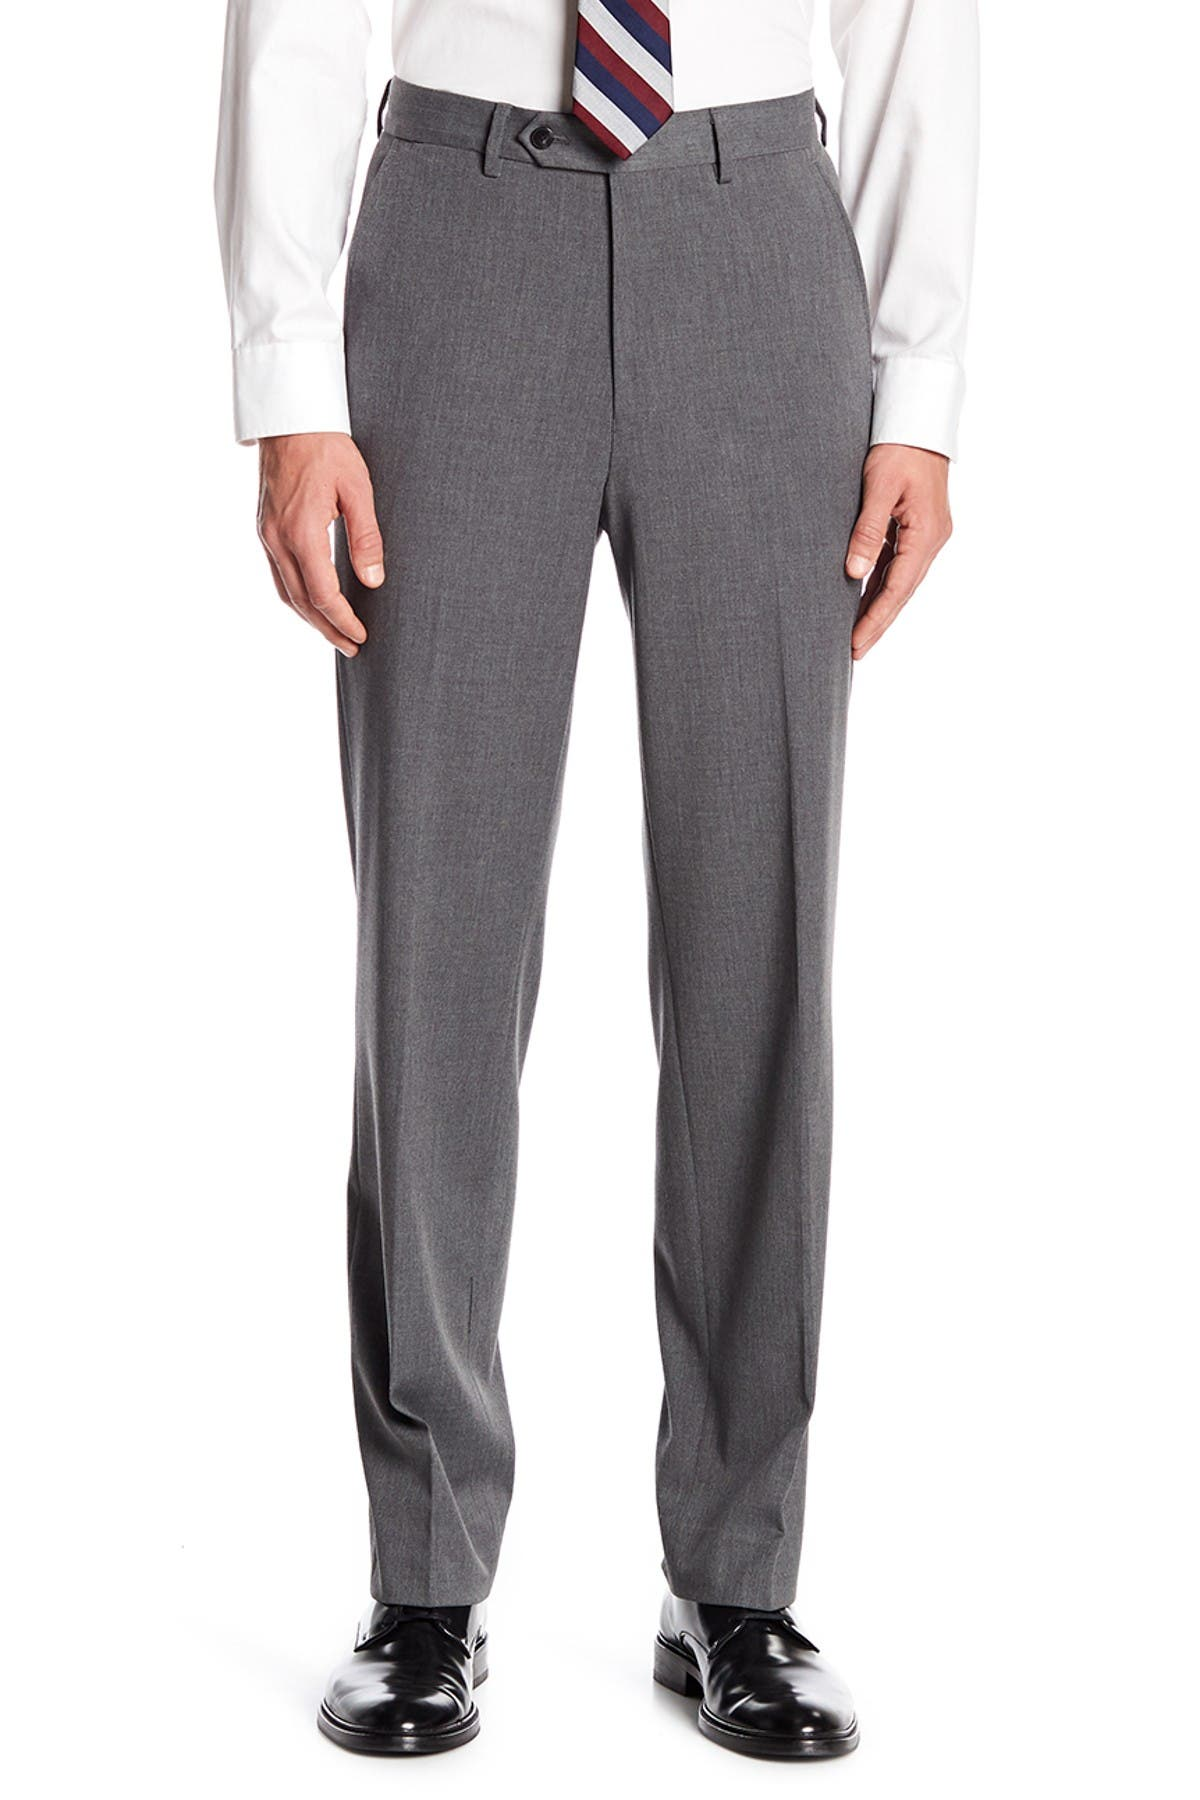 "Image of Nautica Sharkskin Suit Separate Pants - 30-34"" Inseam"